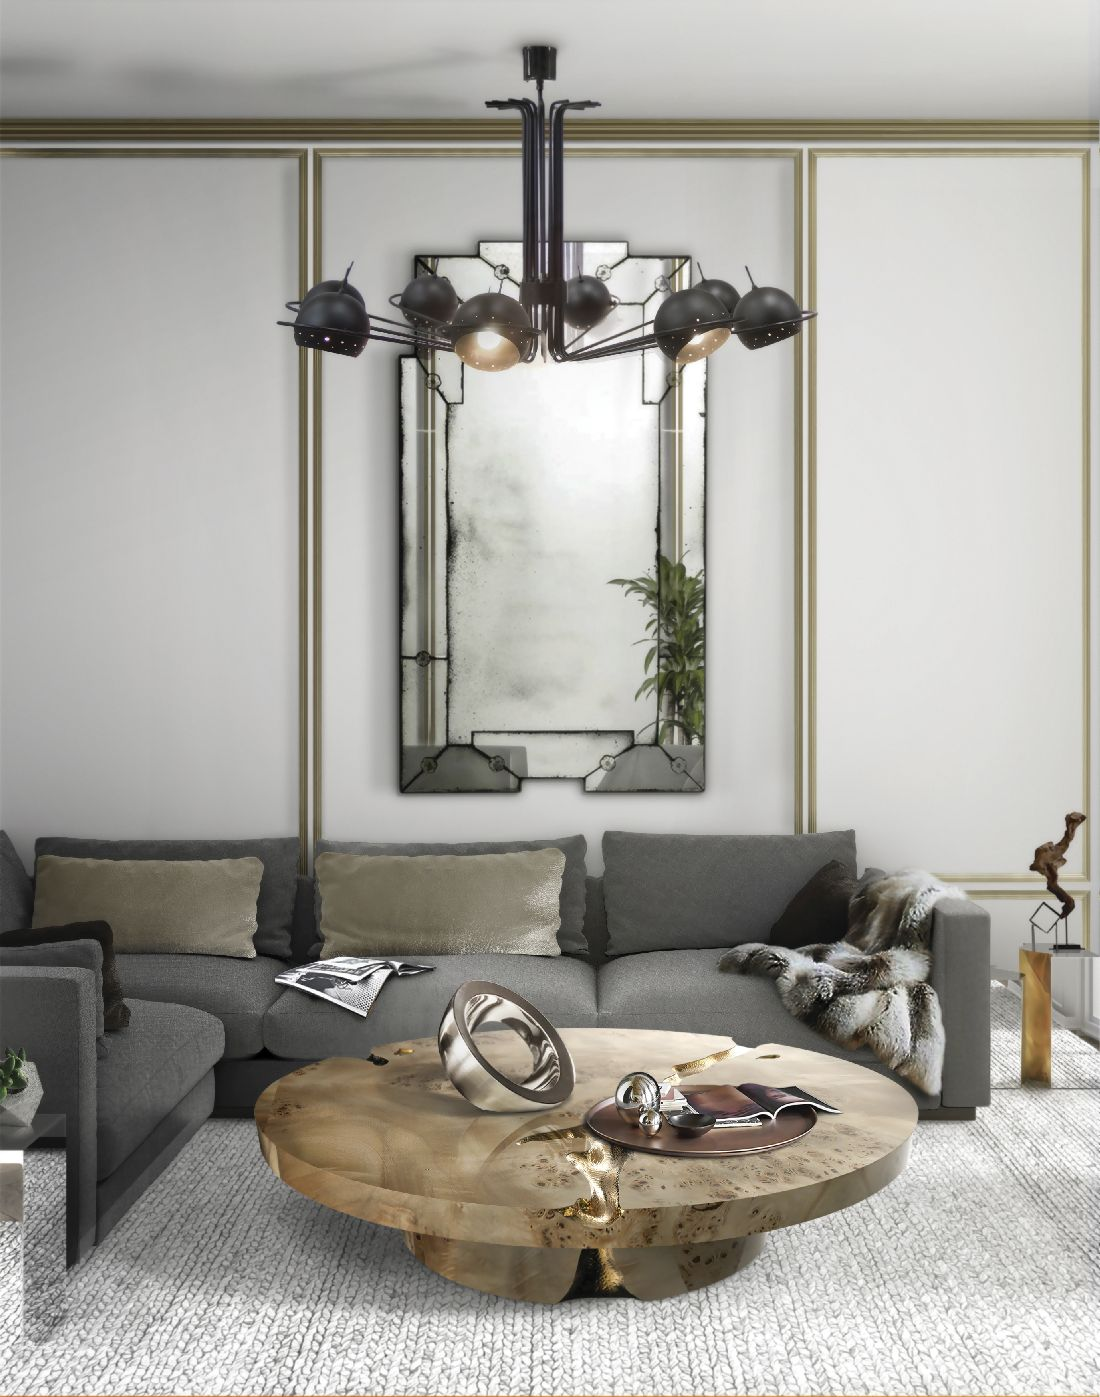 5covet-house_living-room-_-contemporary-living-room-design.jpg